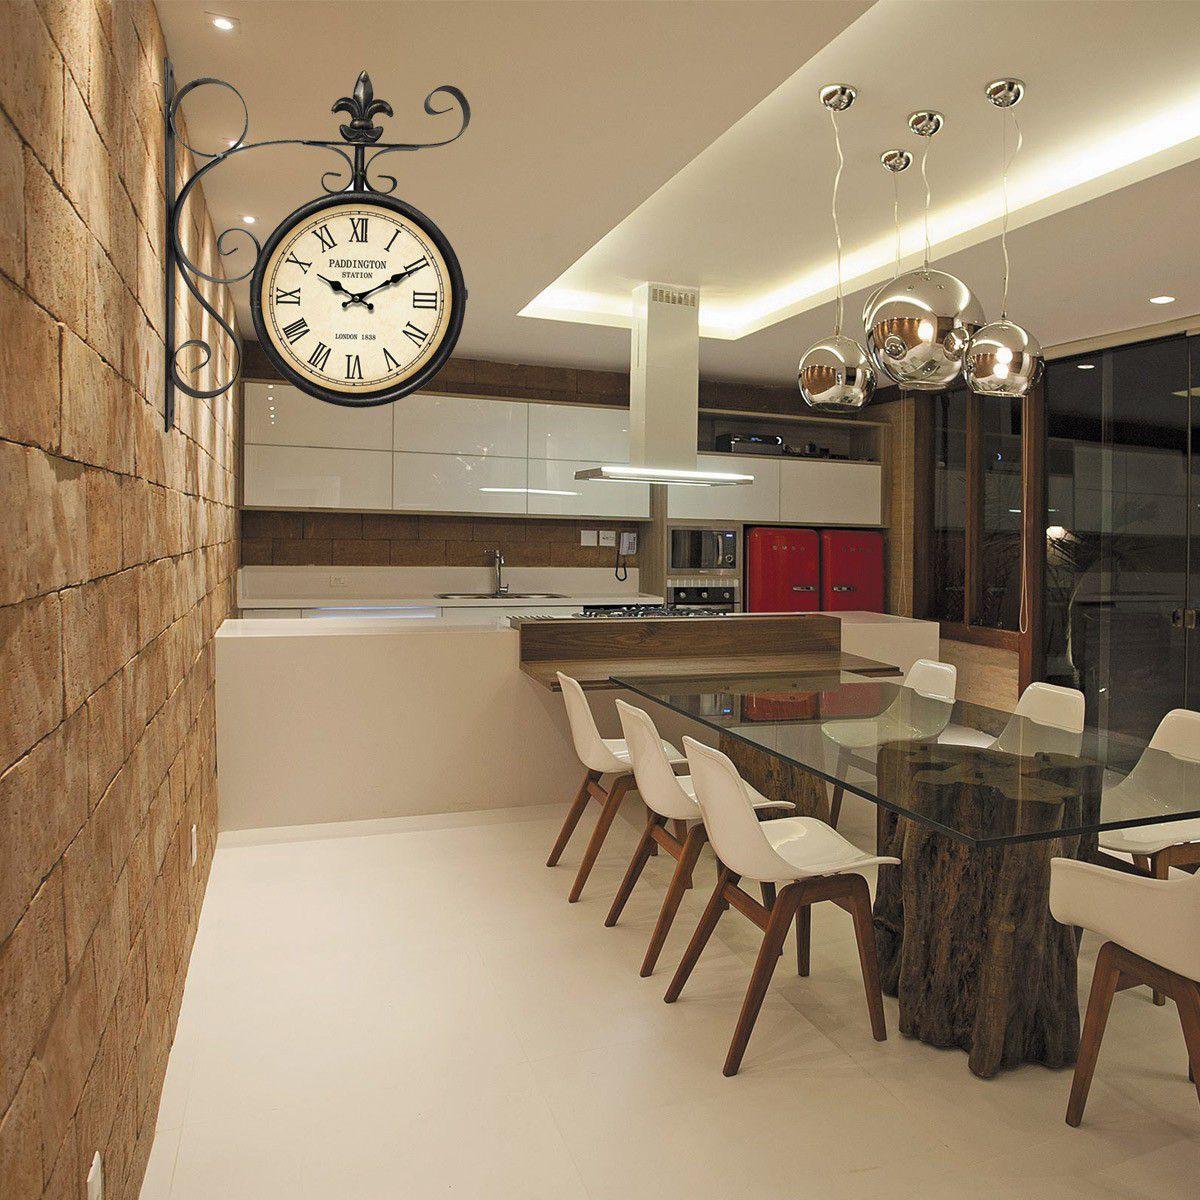 Relógio de parede dupla face Paddington London 1838